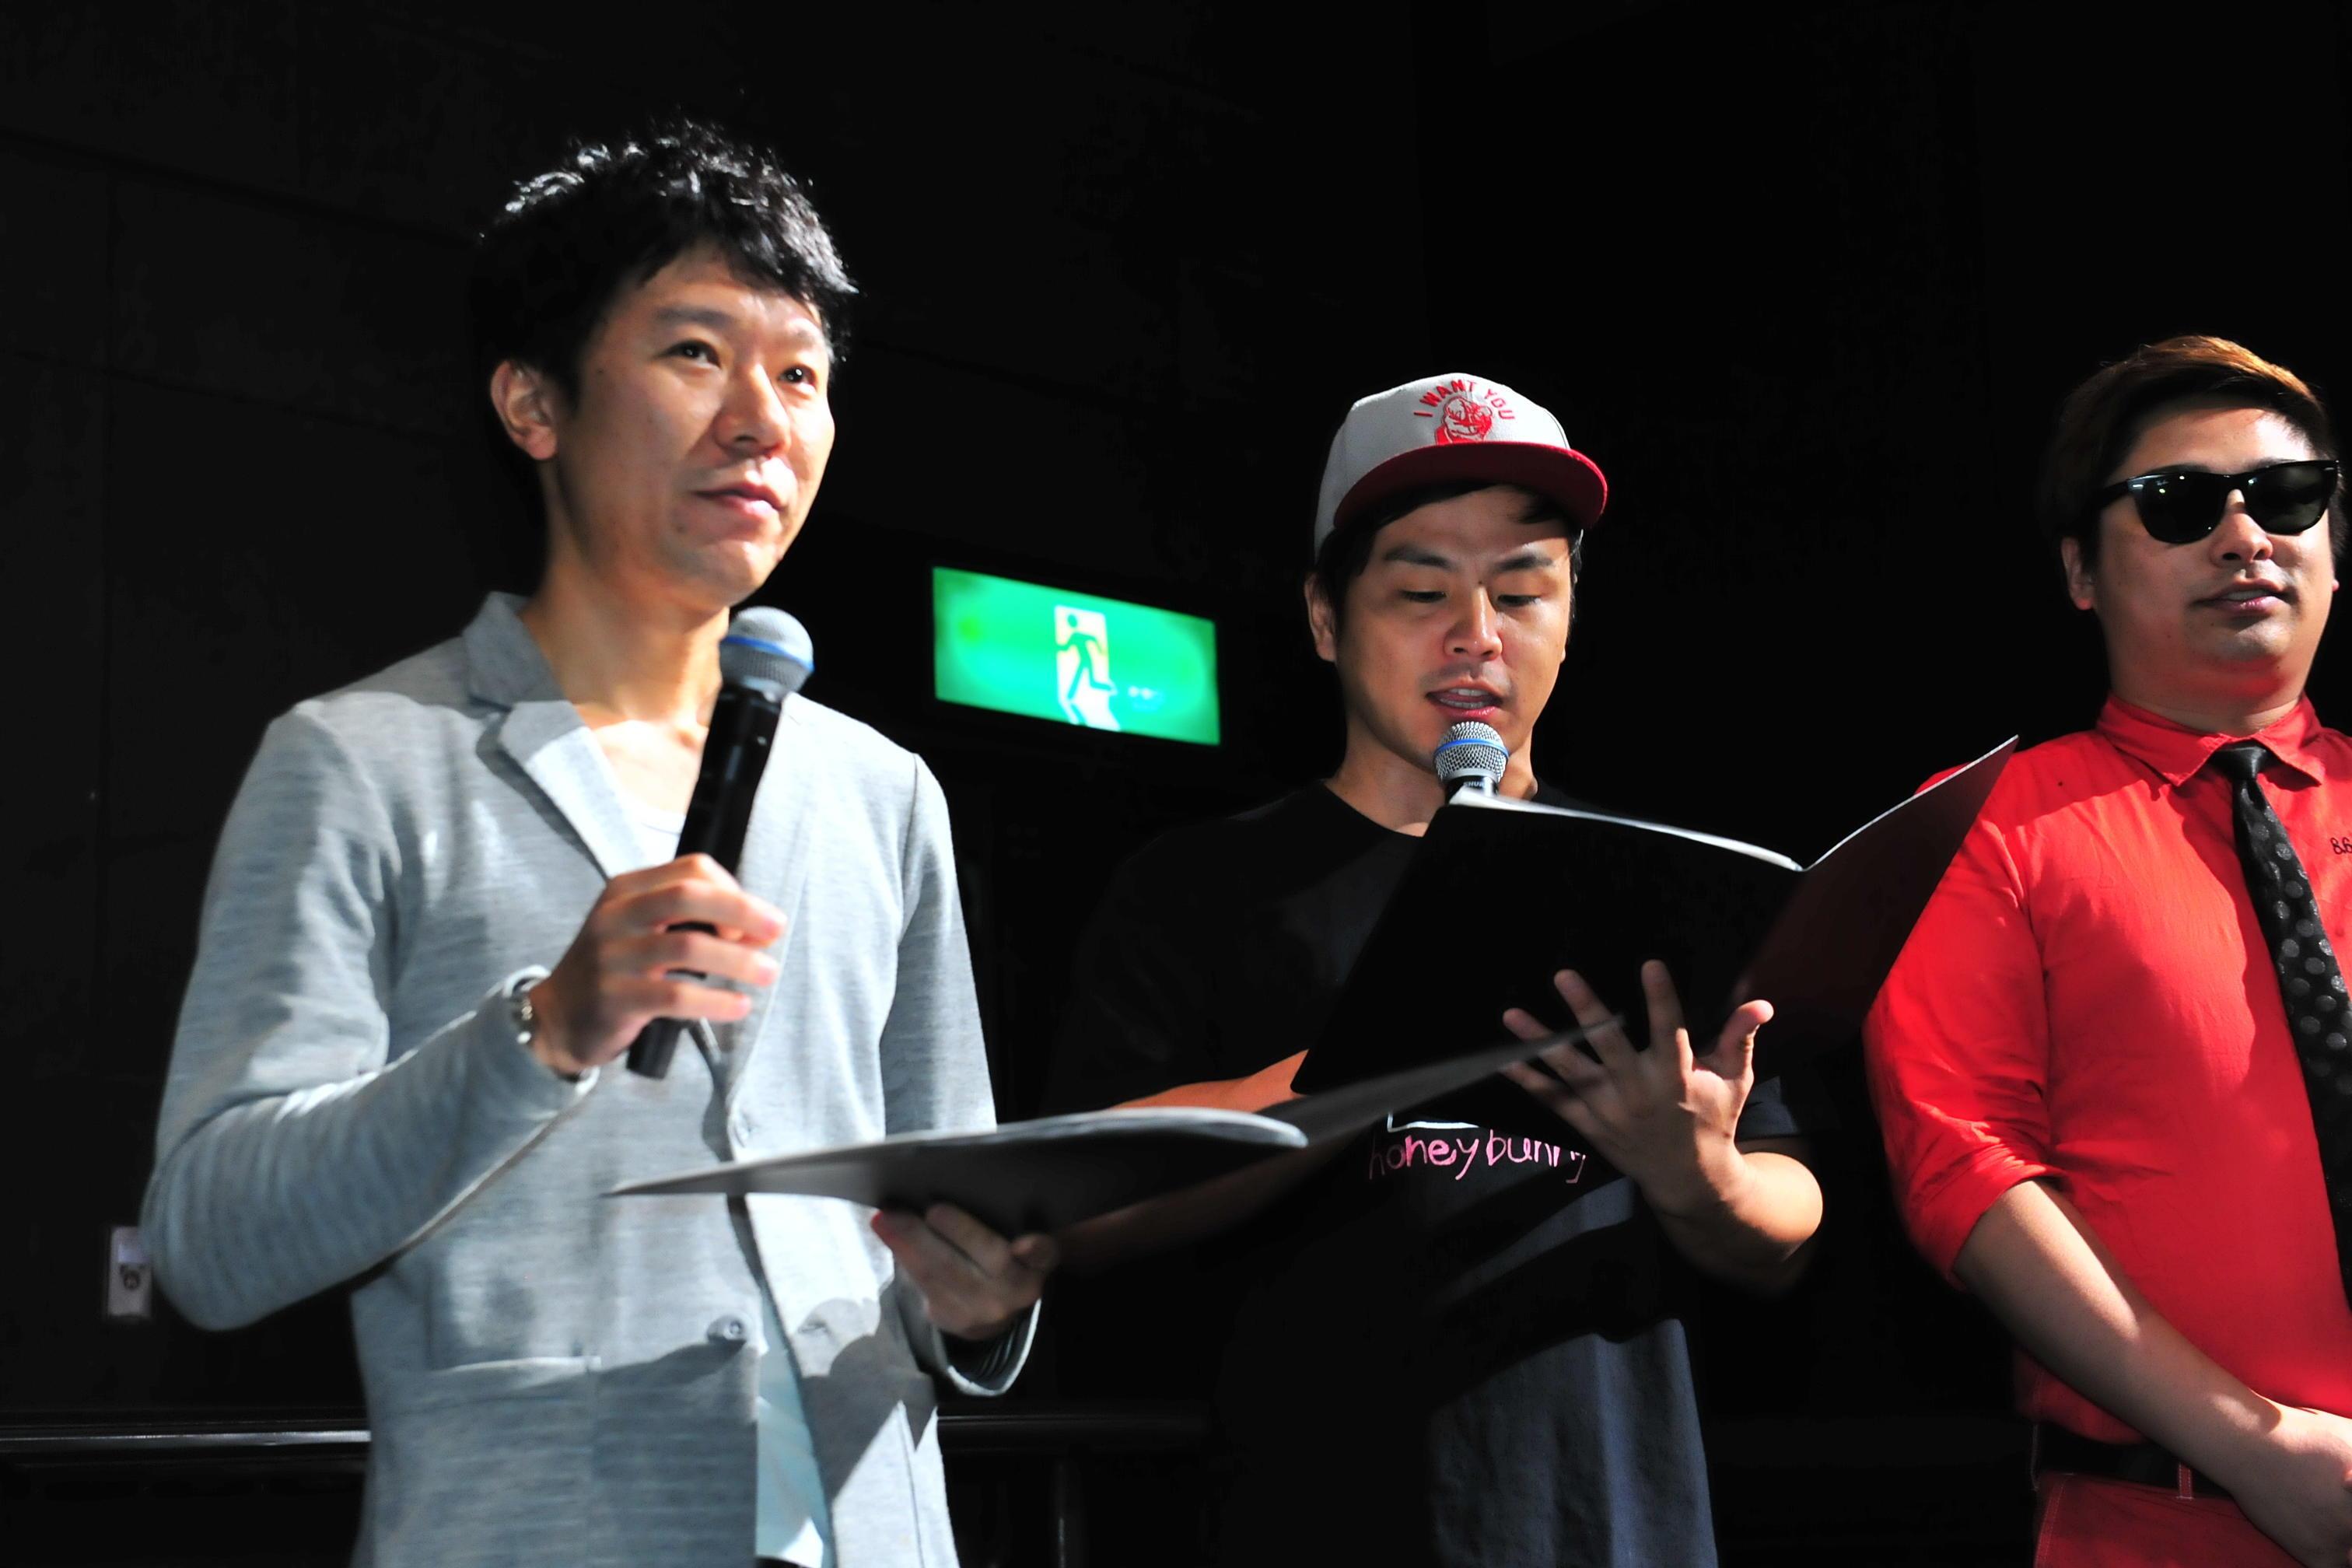 http://news.yoshimoto.co.jp/20160730191950-92714705188f6736c8108278154277e293a0ab03.jpg